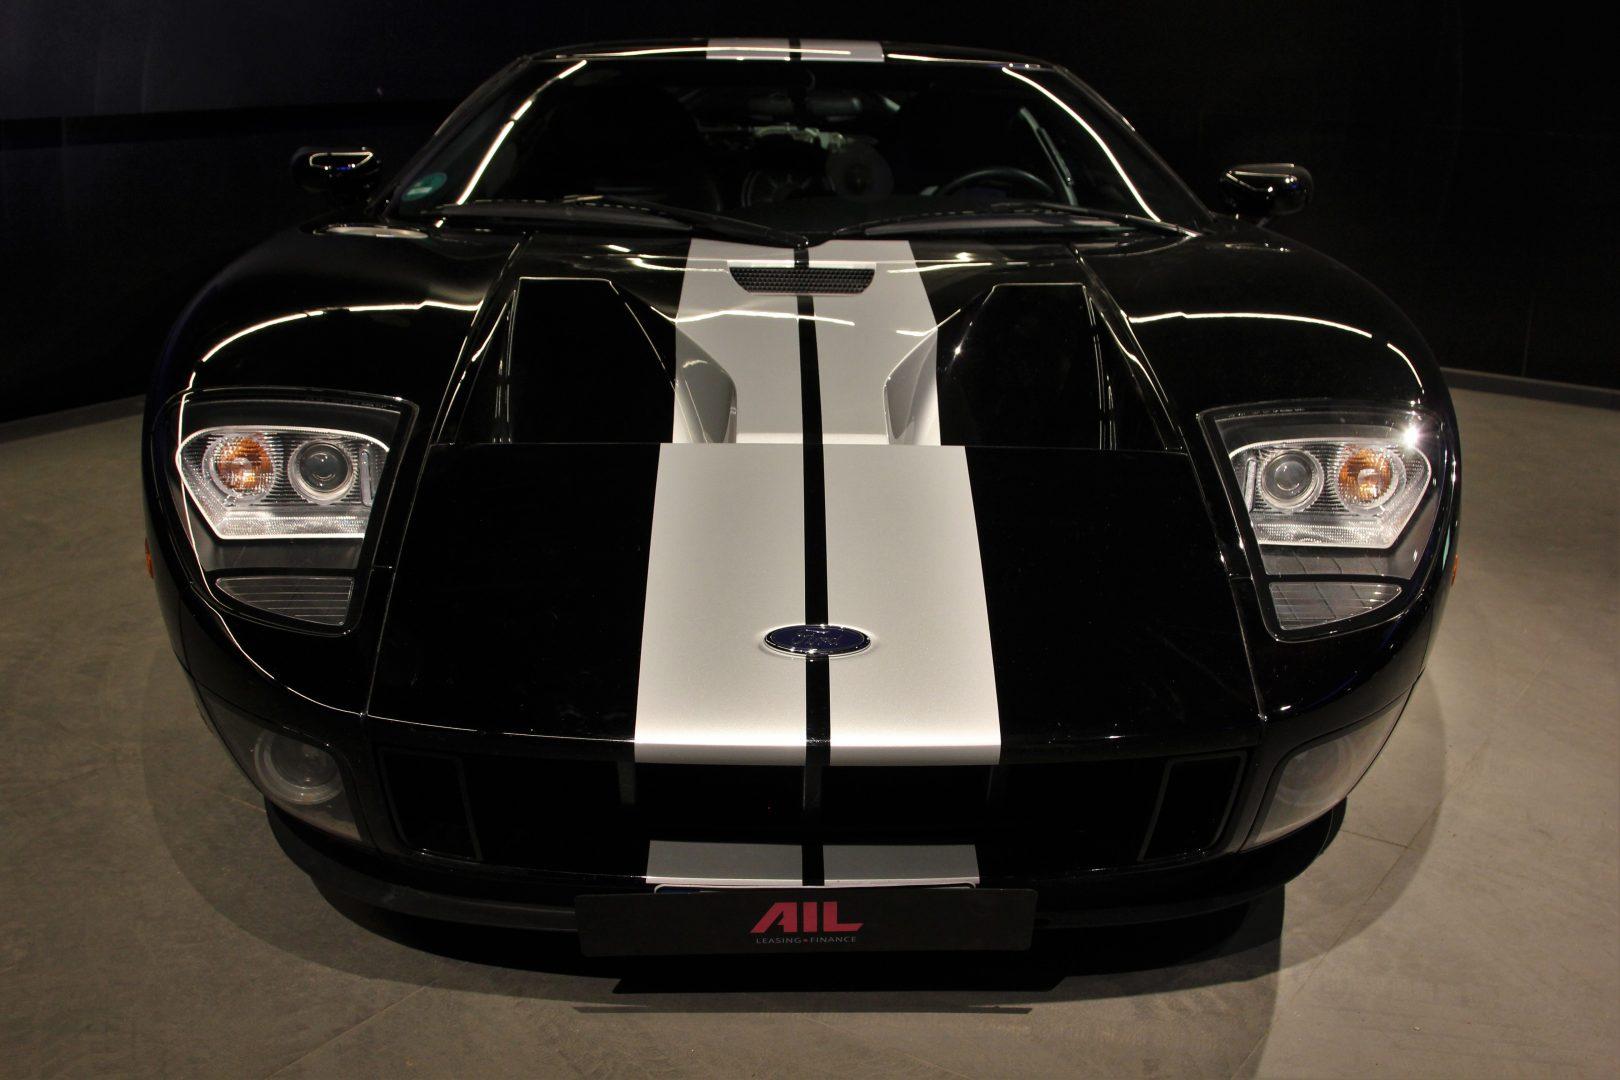 AIL Ford GT 5.4L V8 Supercharger 1